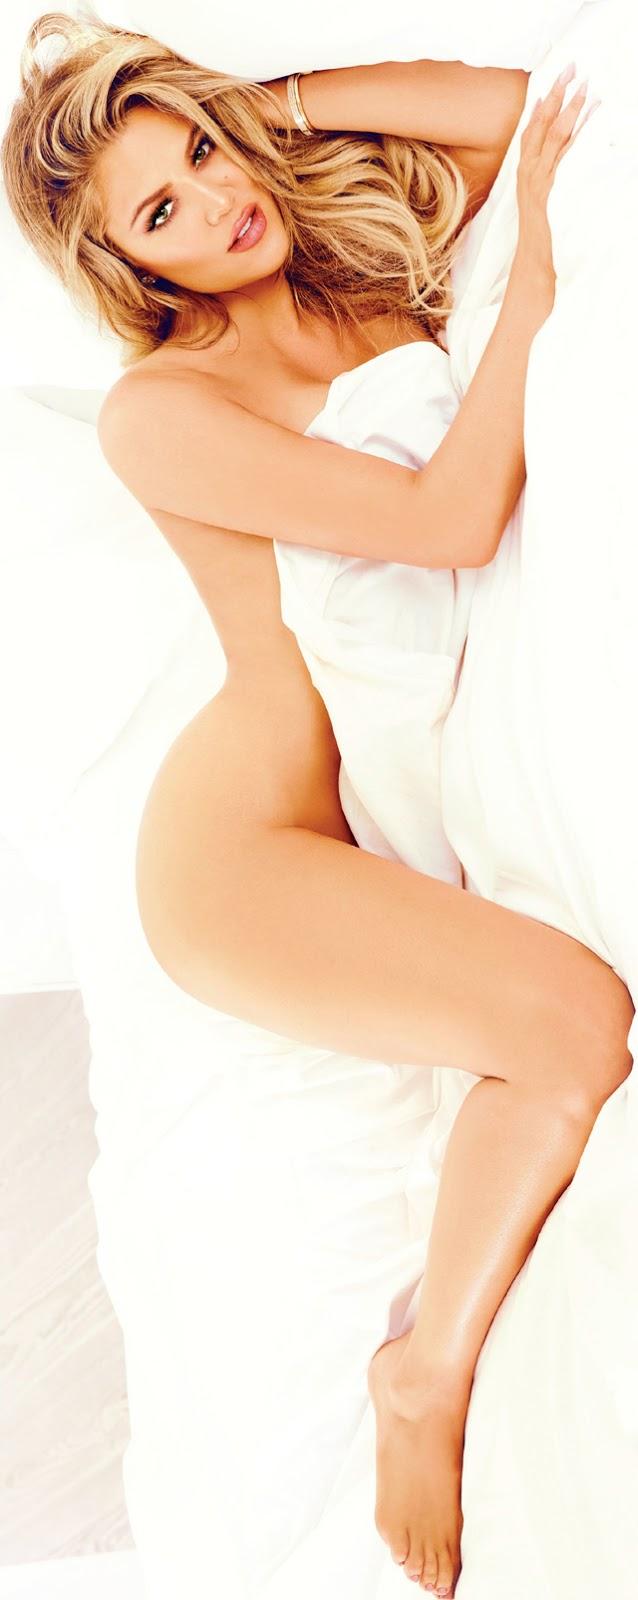 Khloe Kardashian desnuda - Farándula Internacional - Parejas Disparejas